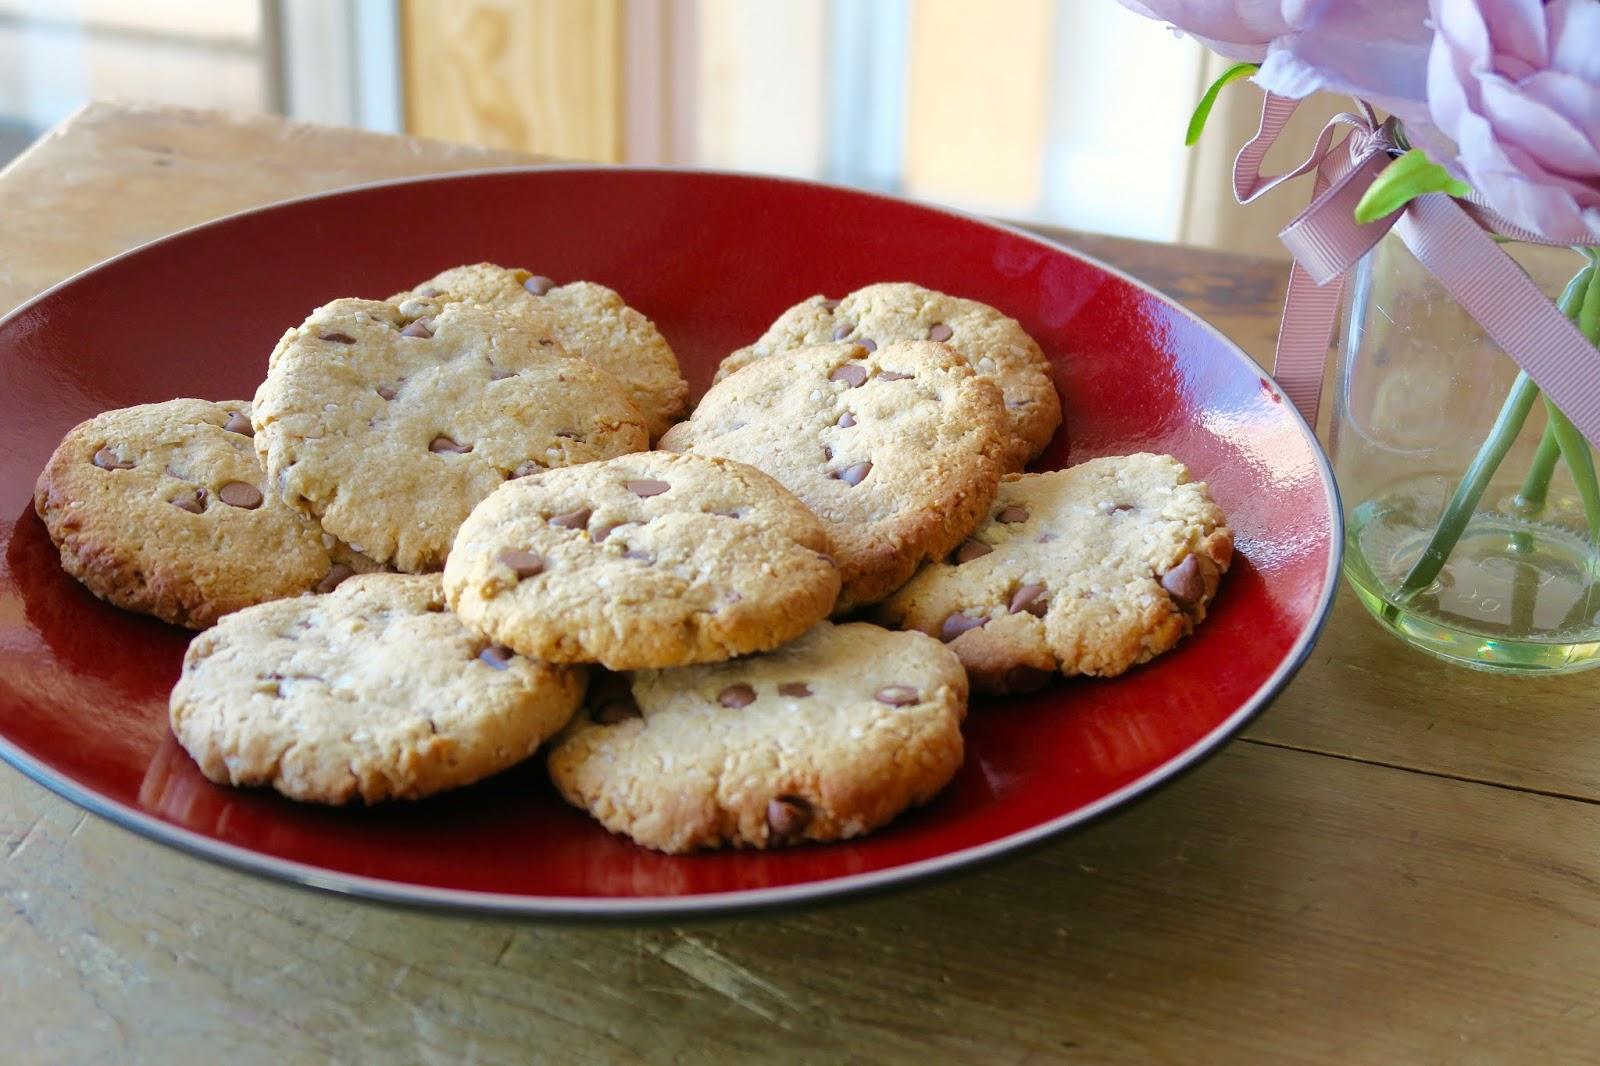 Gluten free almond chocolate chip cookies